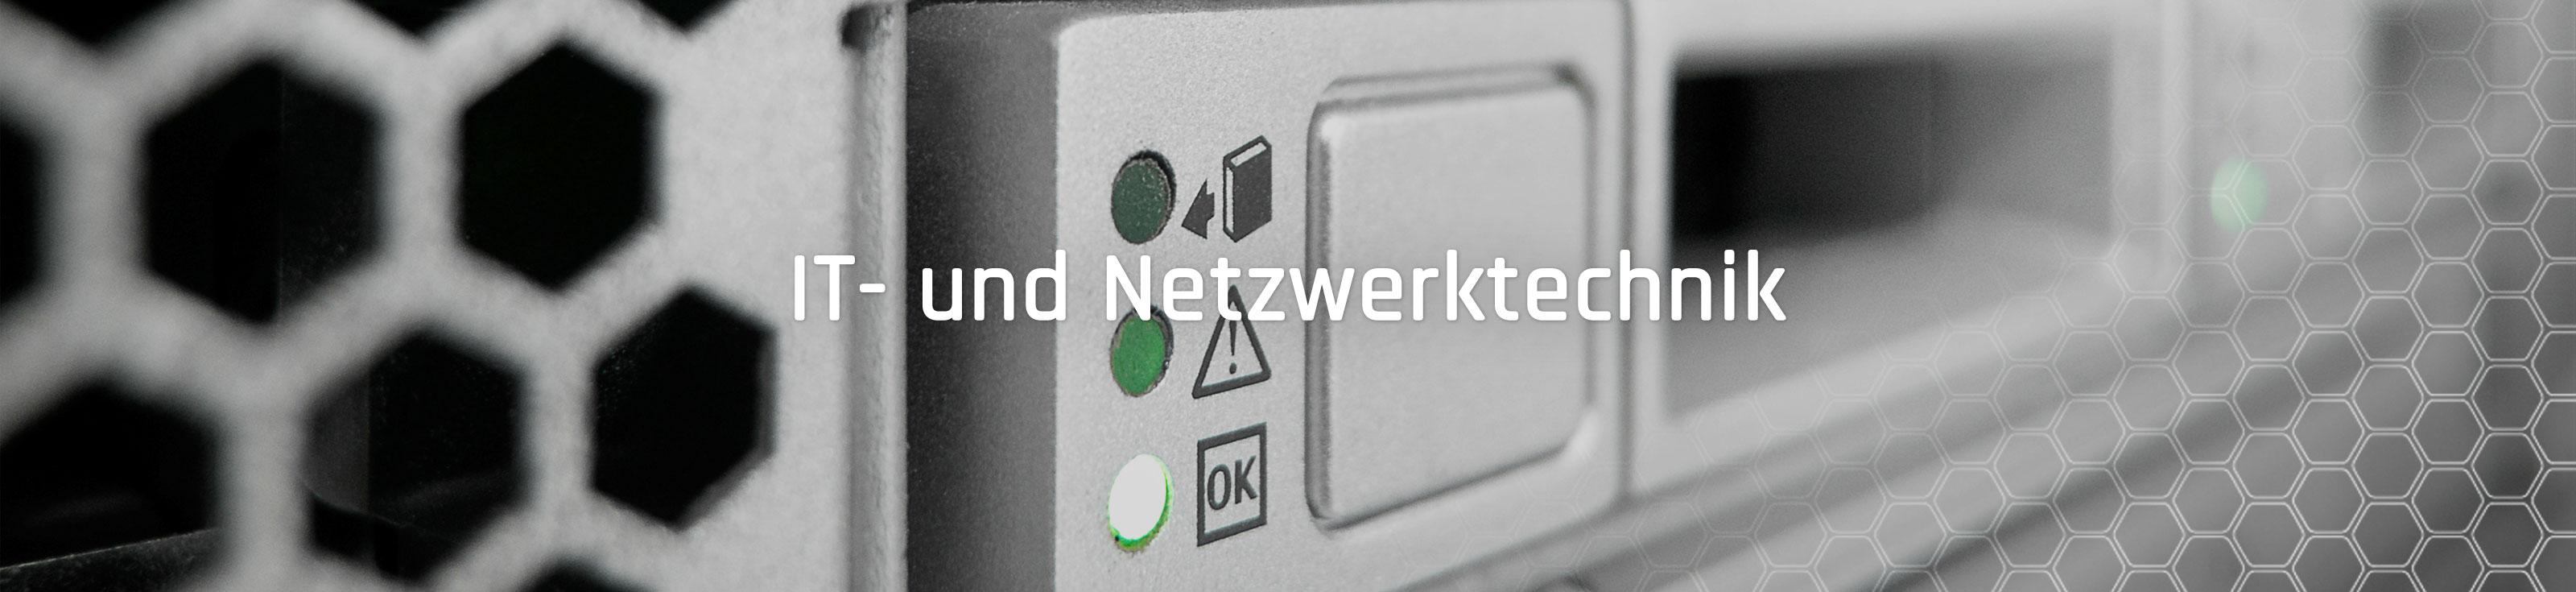 slider_it-netzwerktechnik